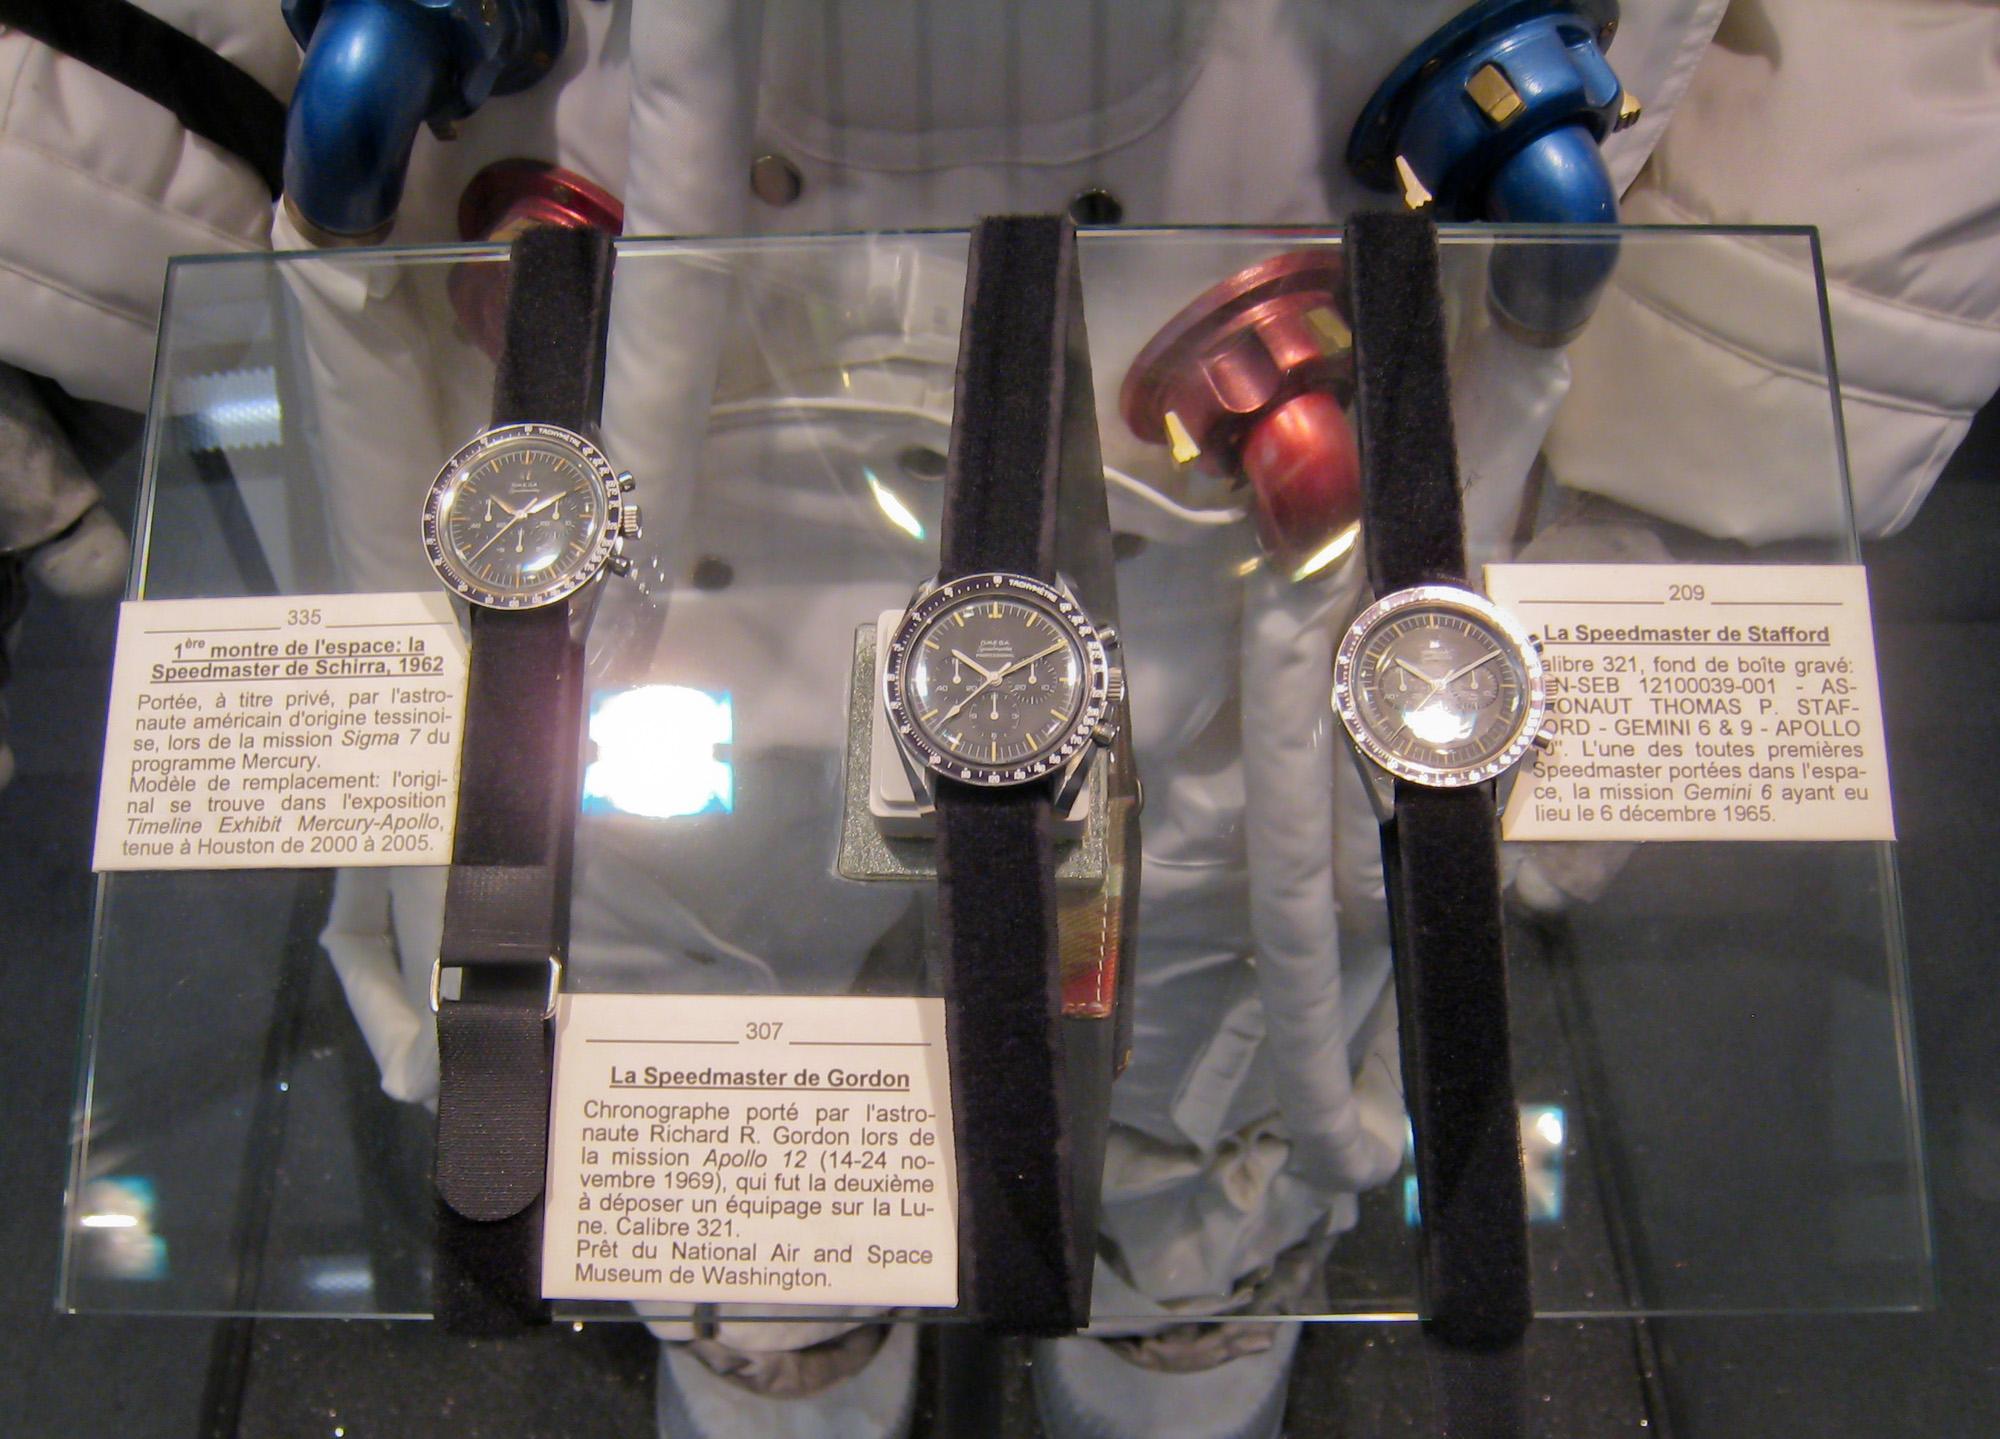 Omega Speedmasters of Schirra, Gordon and Stafford